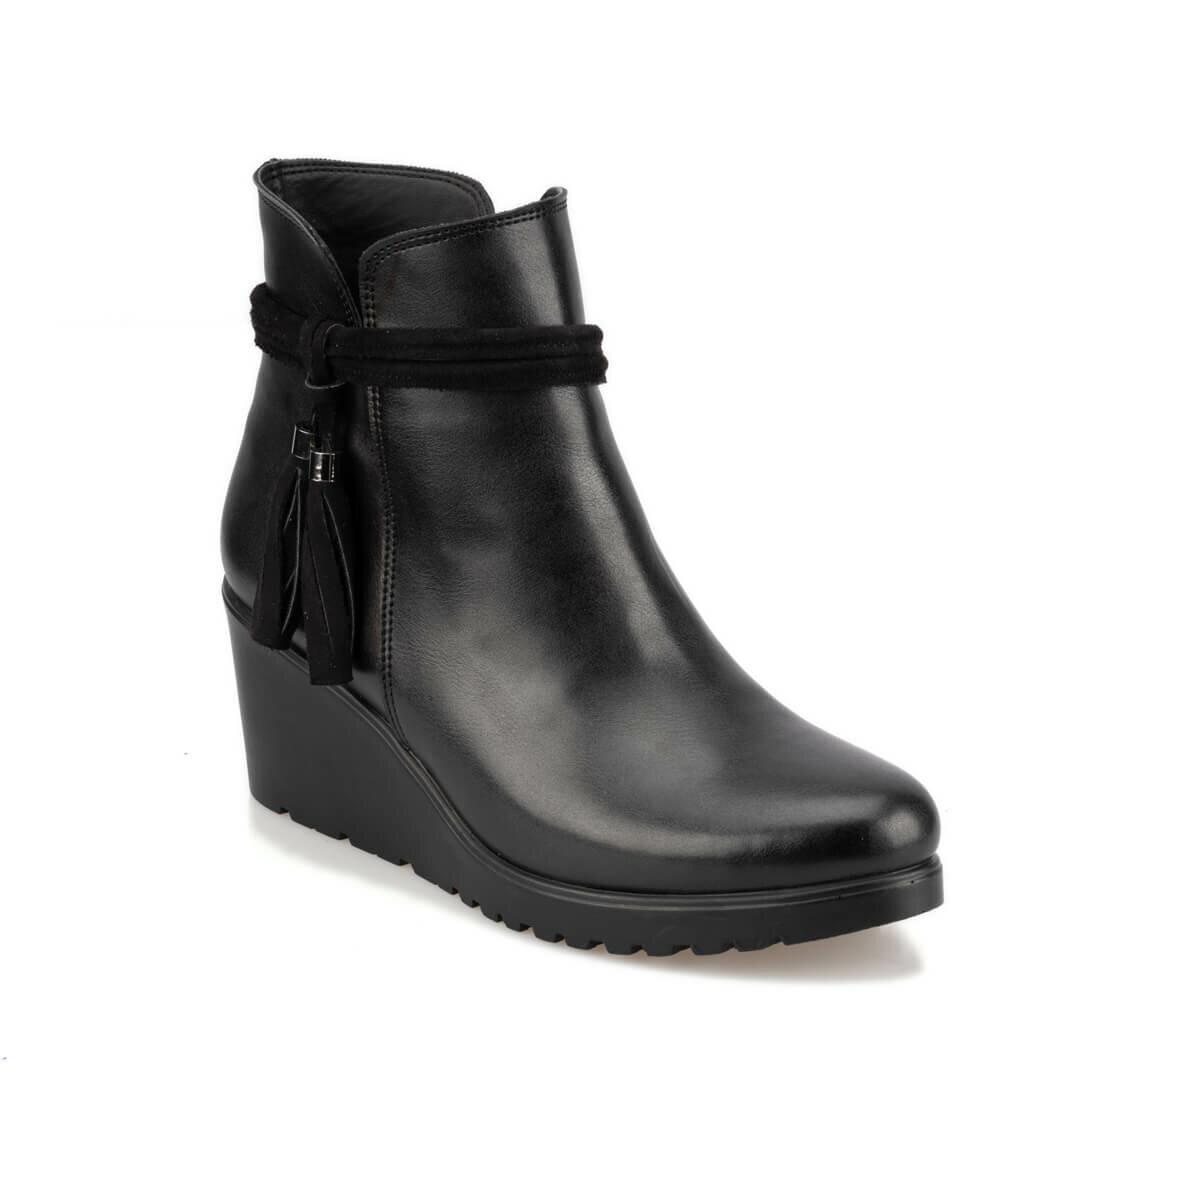 FLO 92.314265.Z Black Women Boots Polaris